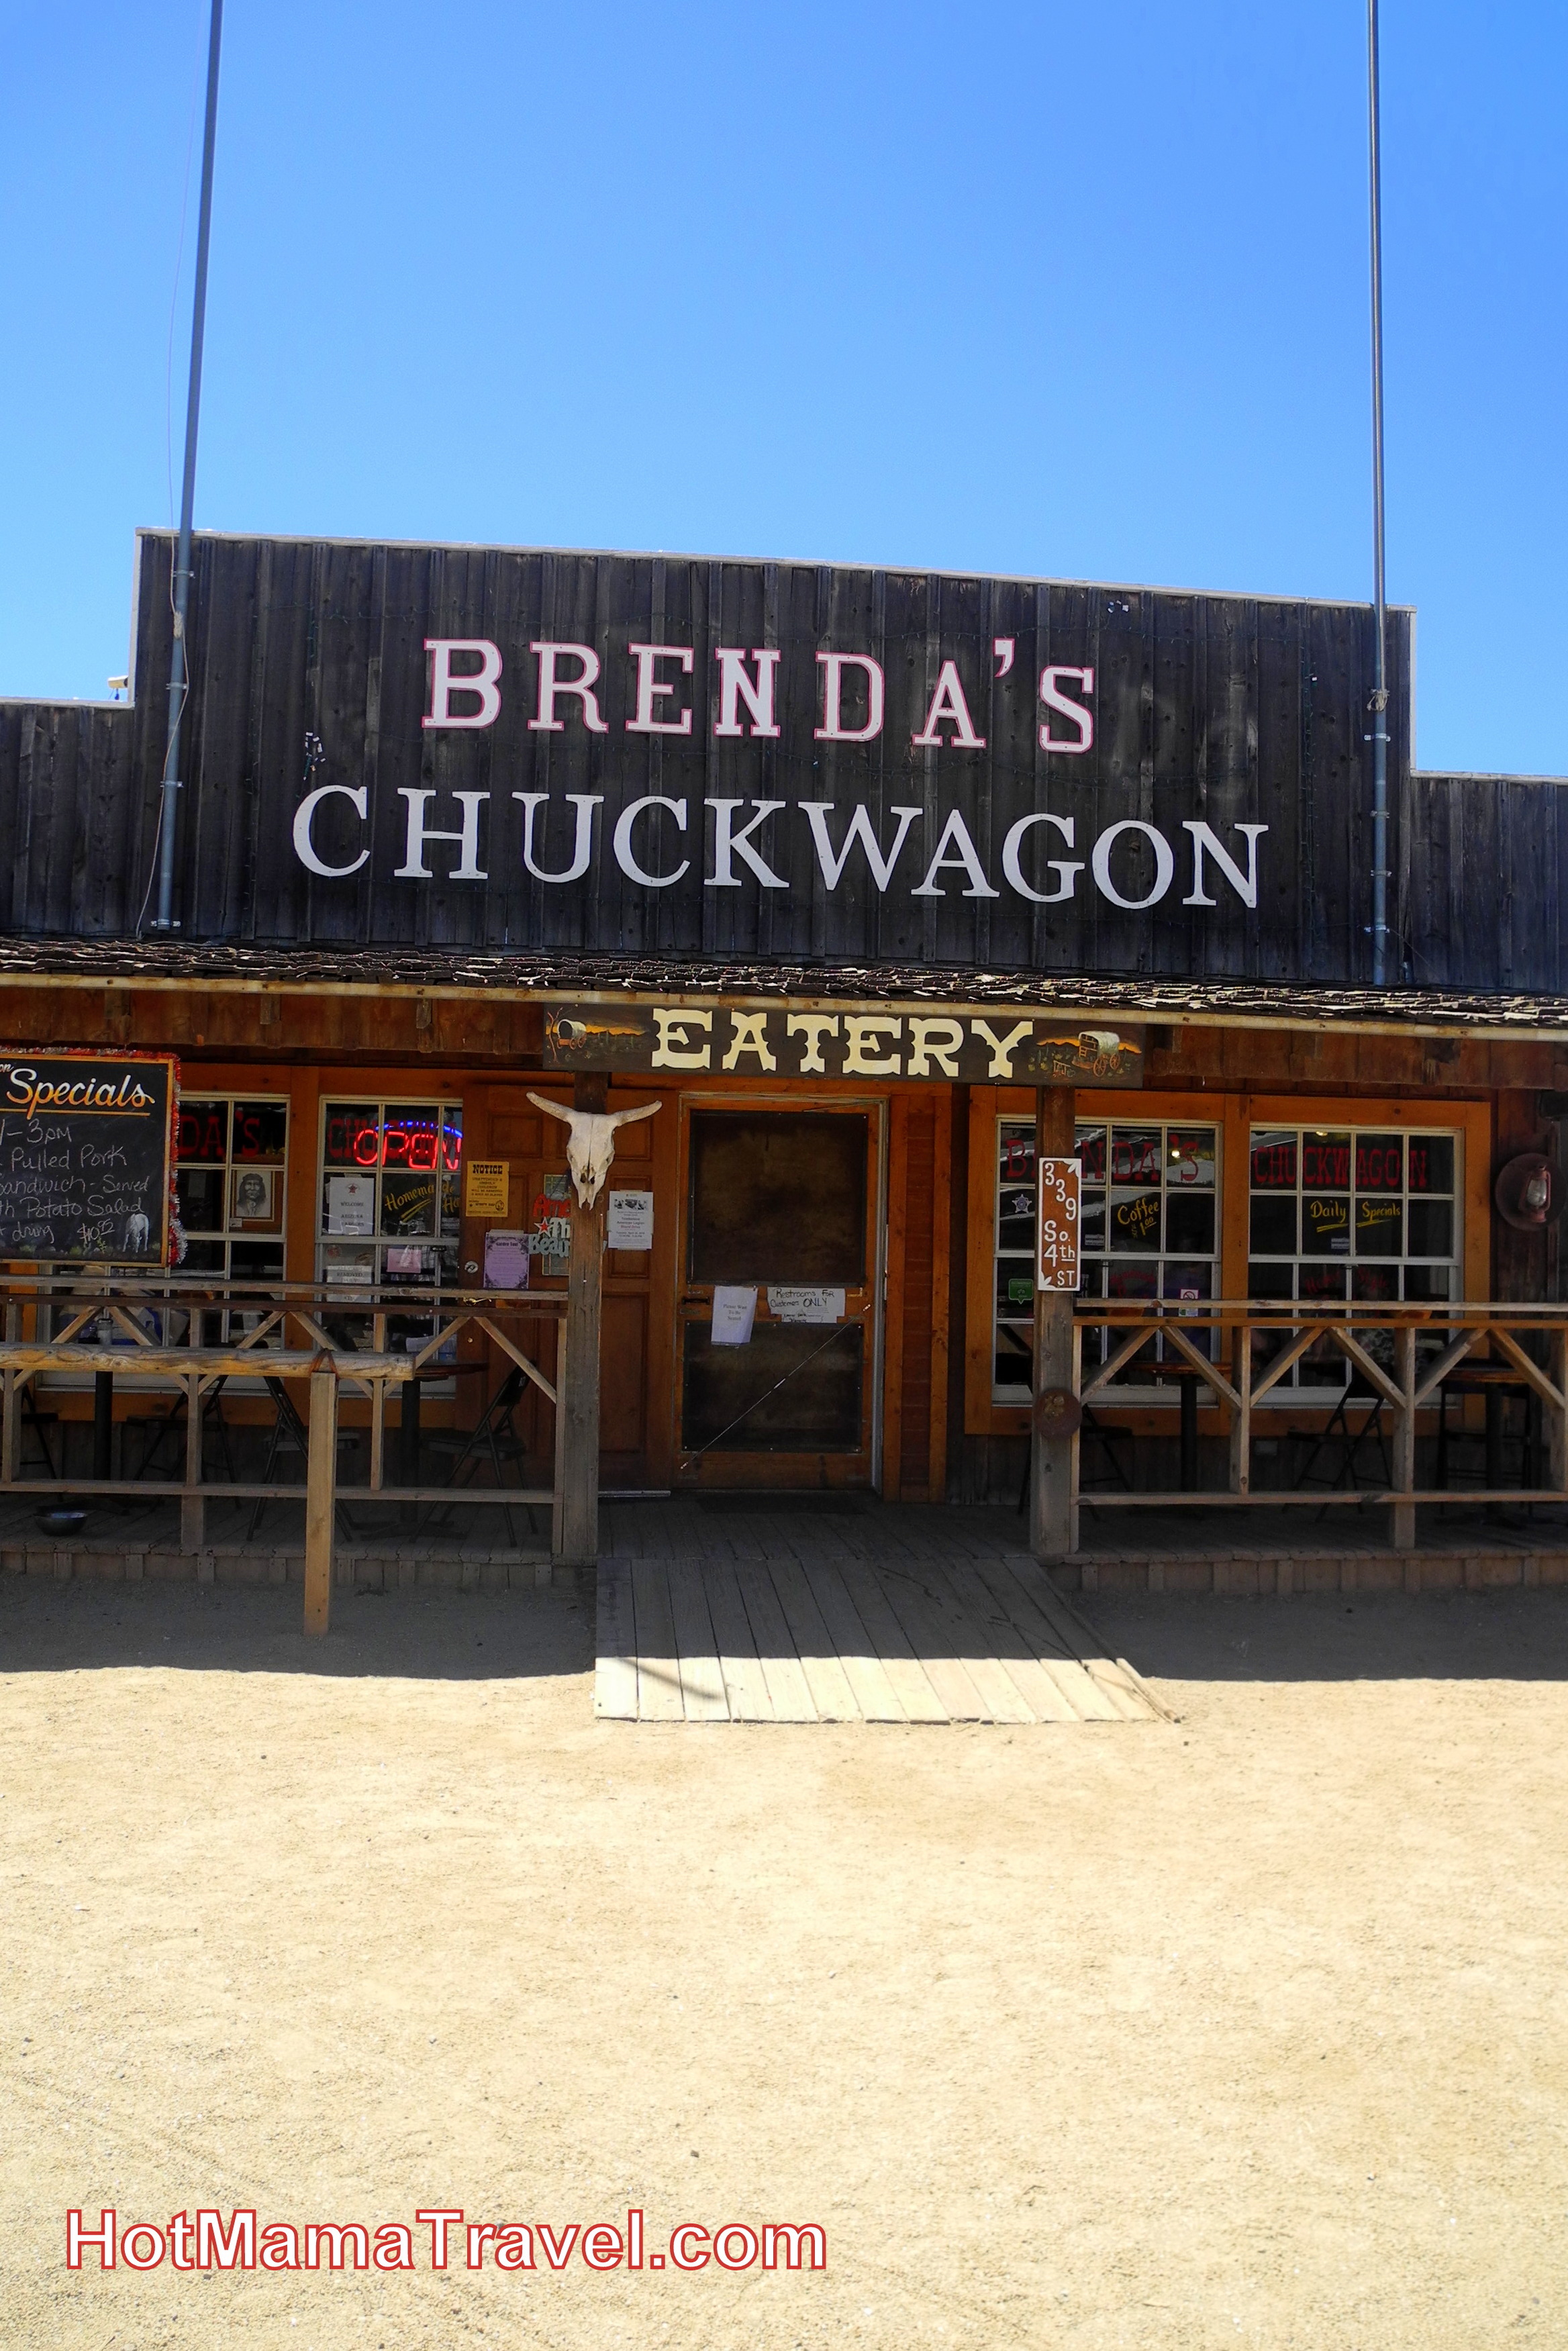 Brenda's Chuckwagon Eatery